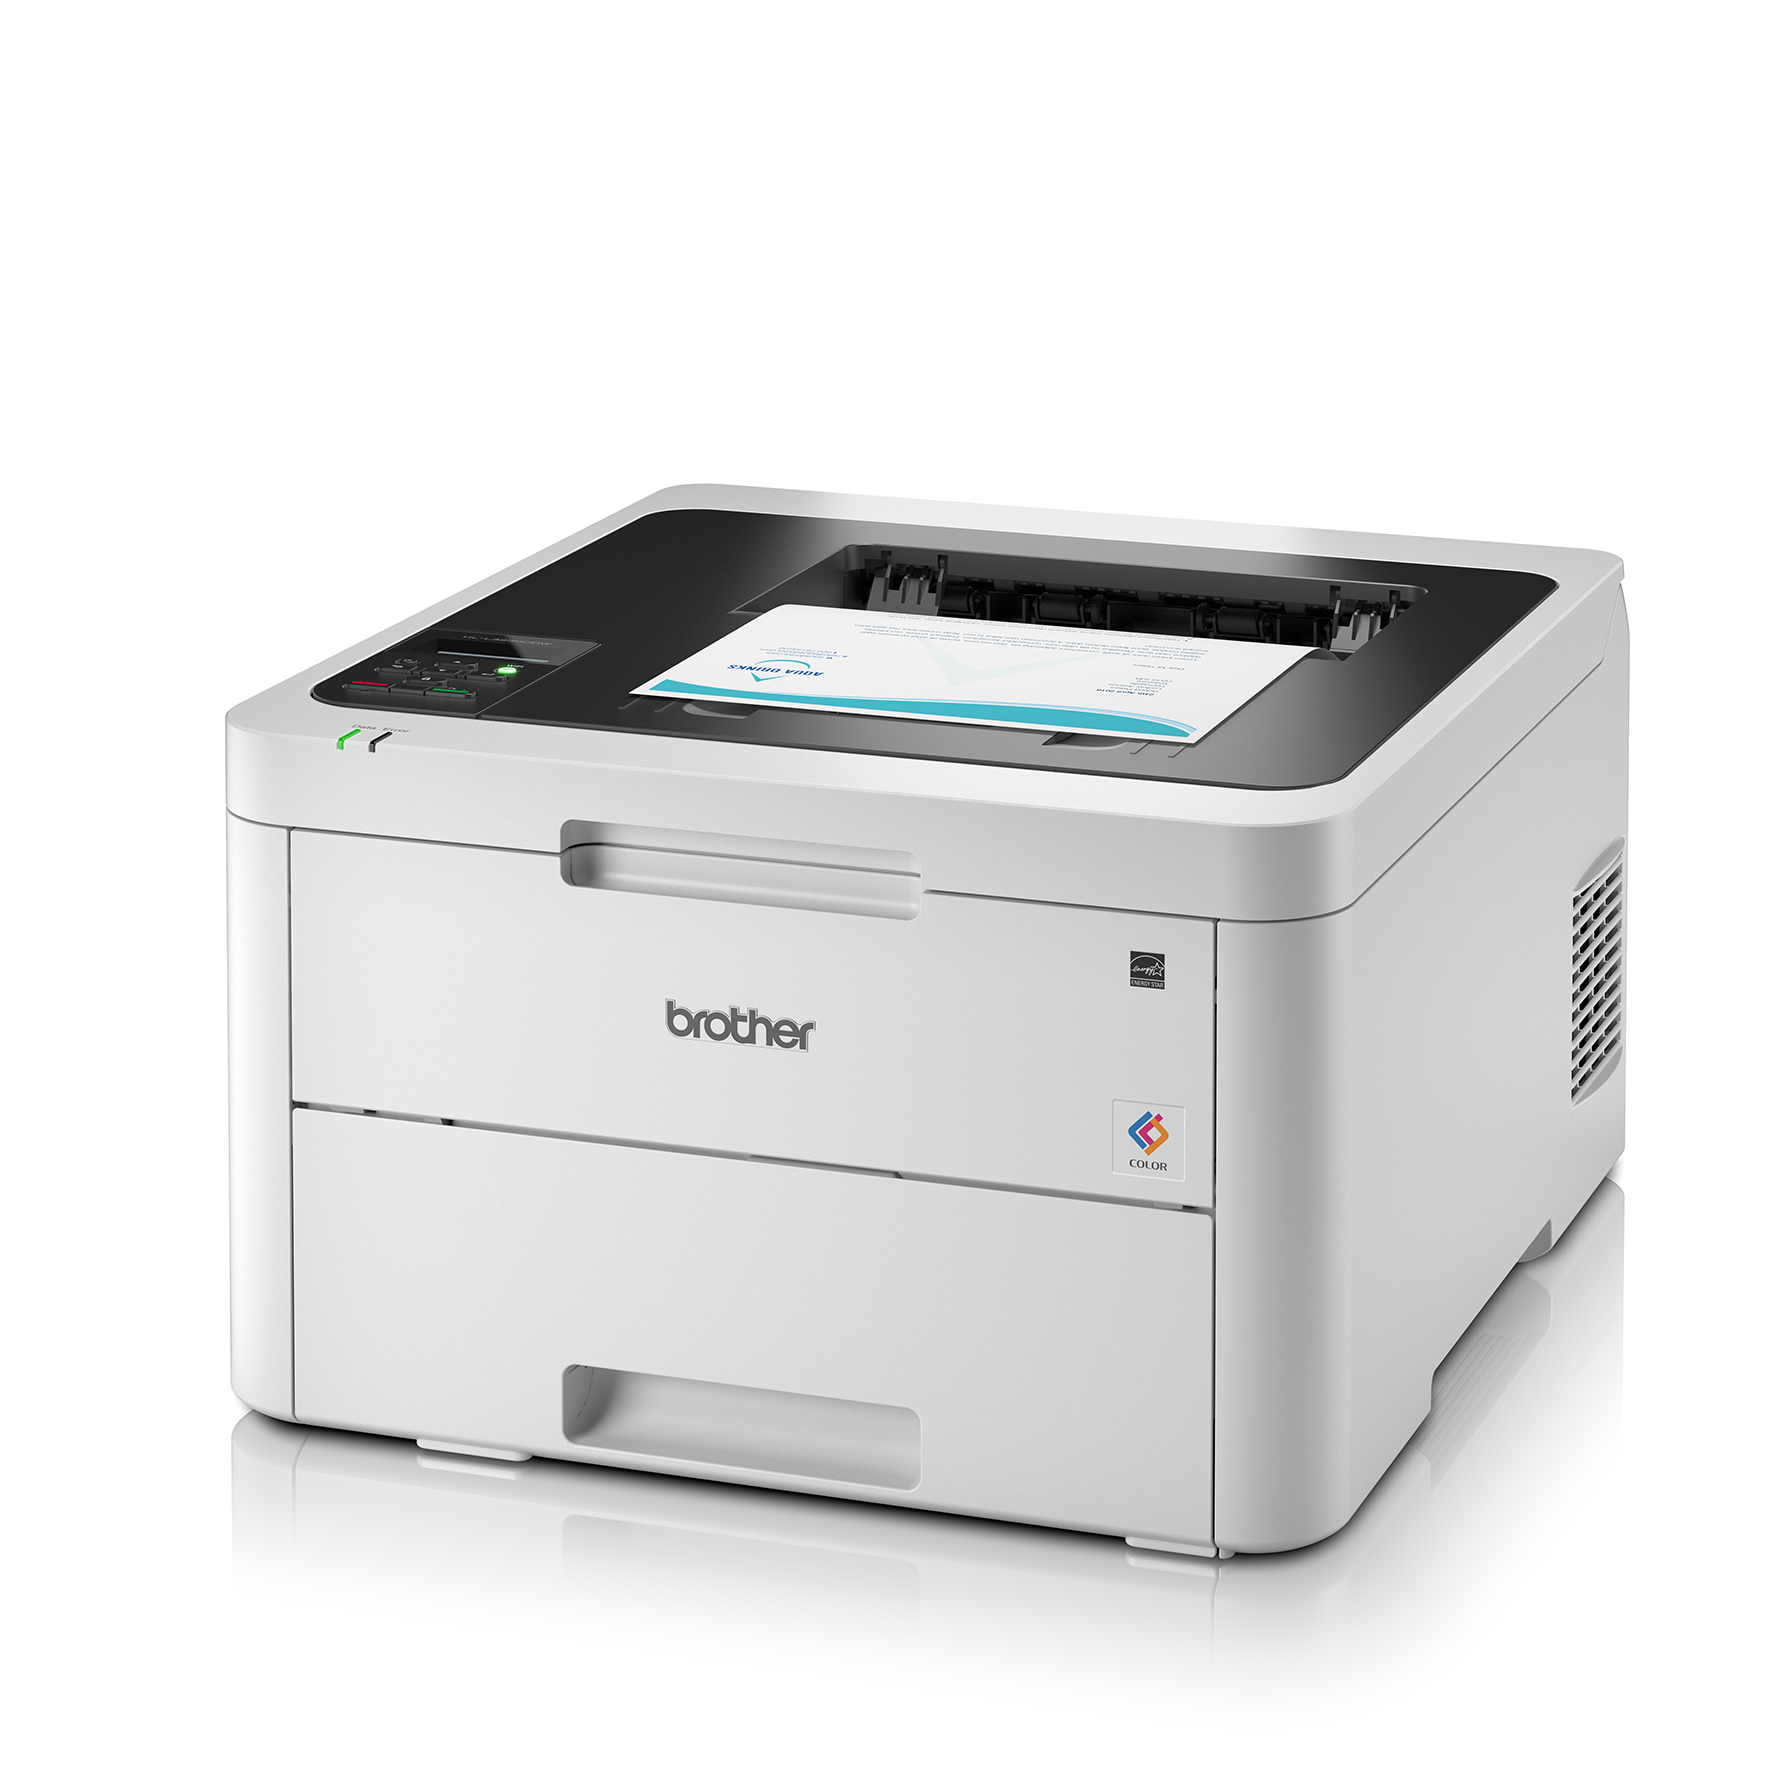 ORIGINAL Brother Drucker HL-L3230CDW HLL3230CDWG1 Brother HL-L3230CDW Farblaserdrucker